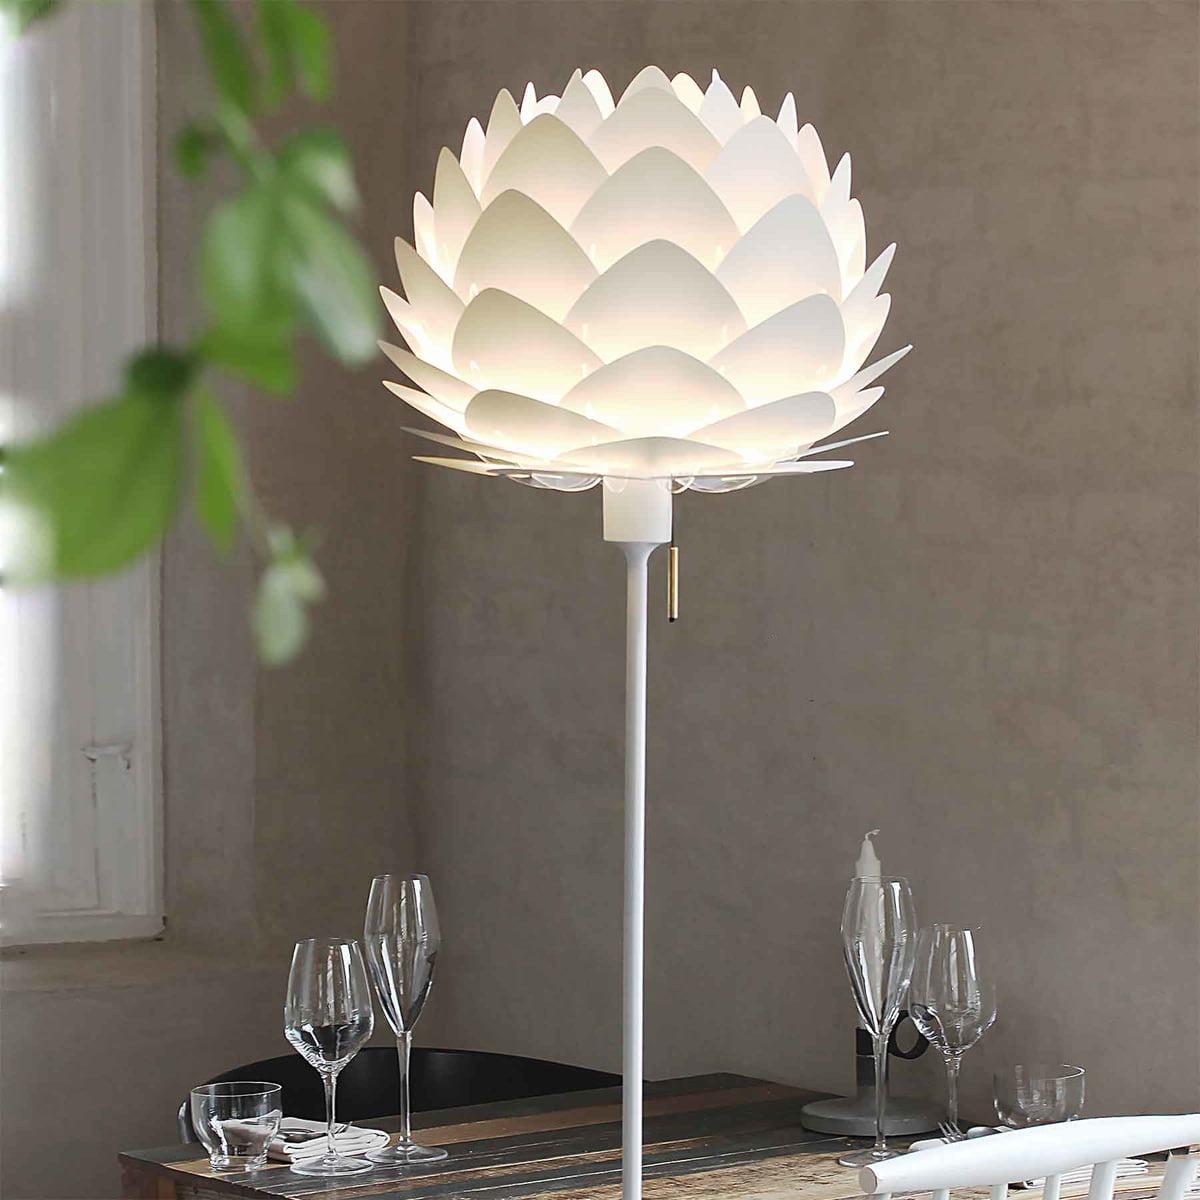 aluvia lampenschirm von vita connox shop. Black Bedroom Furniture Sets. Home Design Ideas